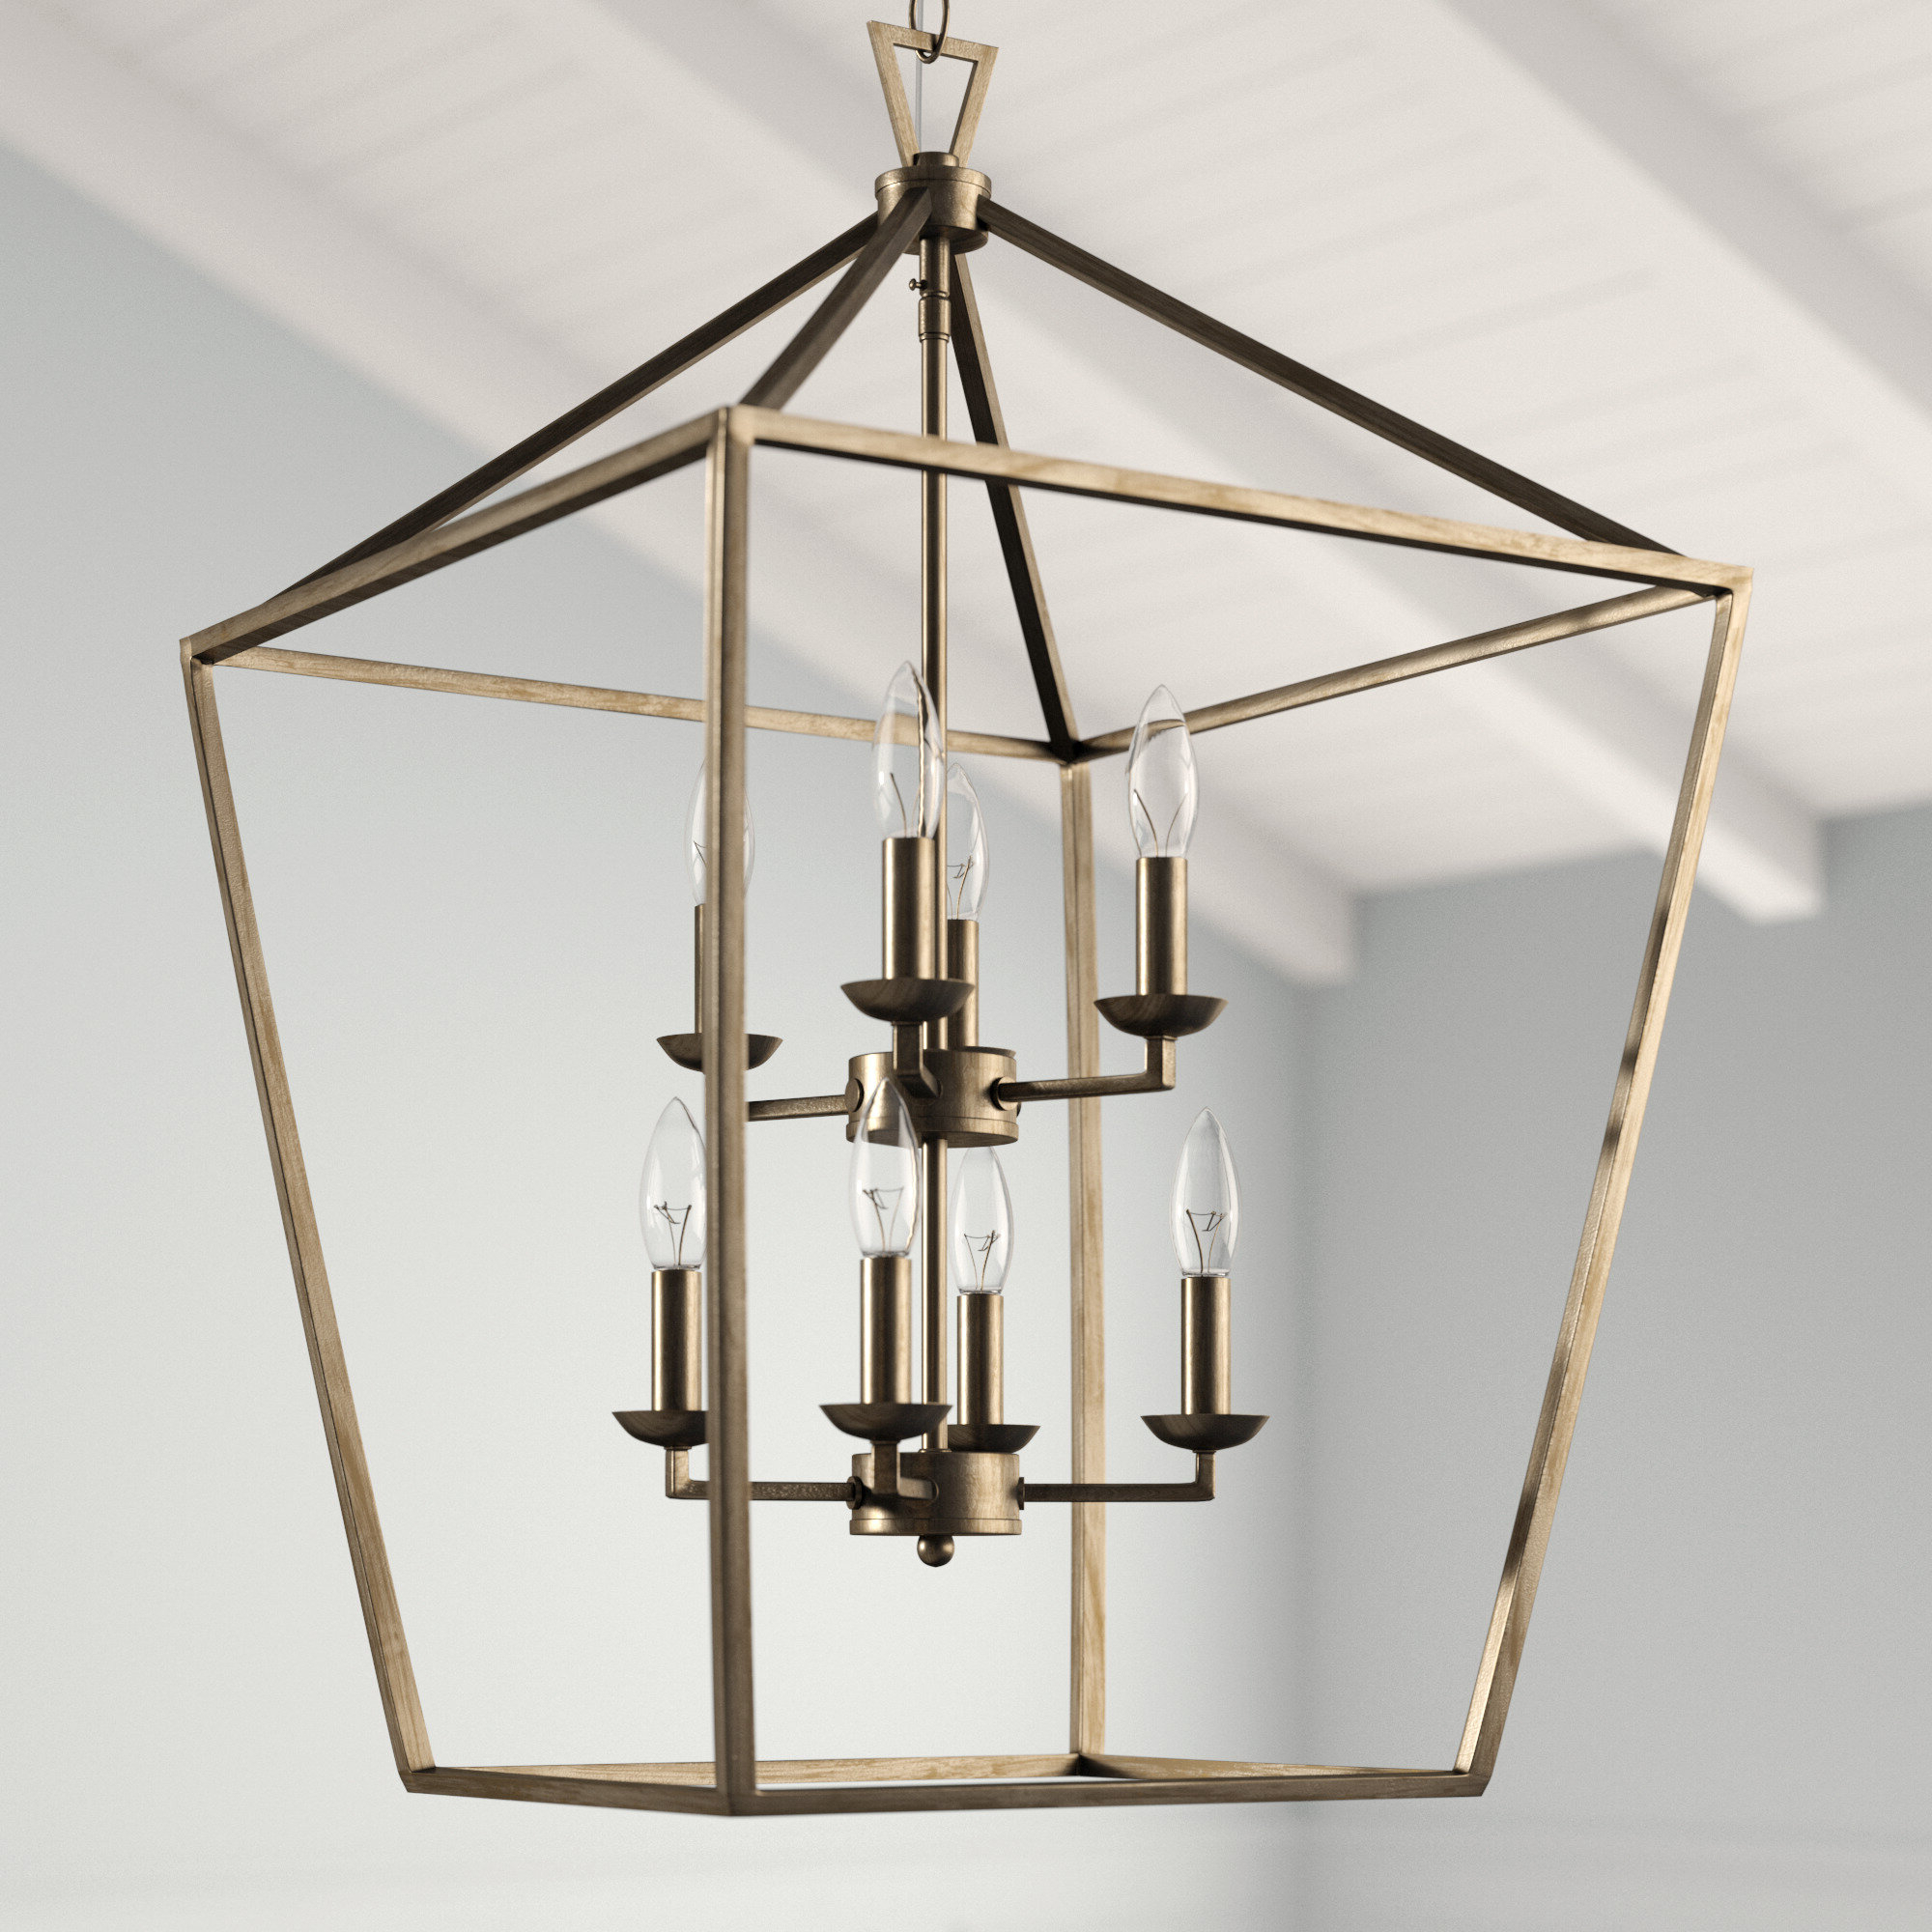 Newest Carmen 8 Light Lantern Geometric Pendant Inside Carmen 8 Light Lantern Tiered Pendants (Gallery 5 of 20)